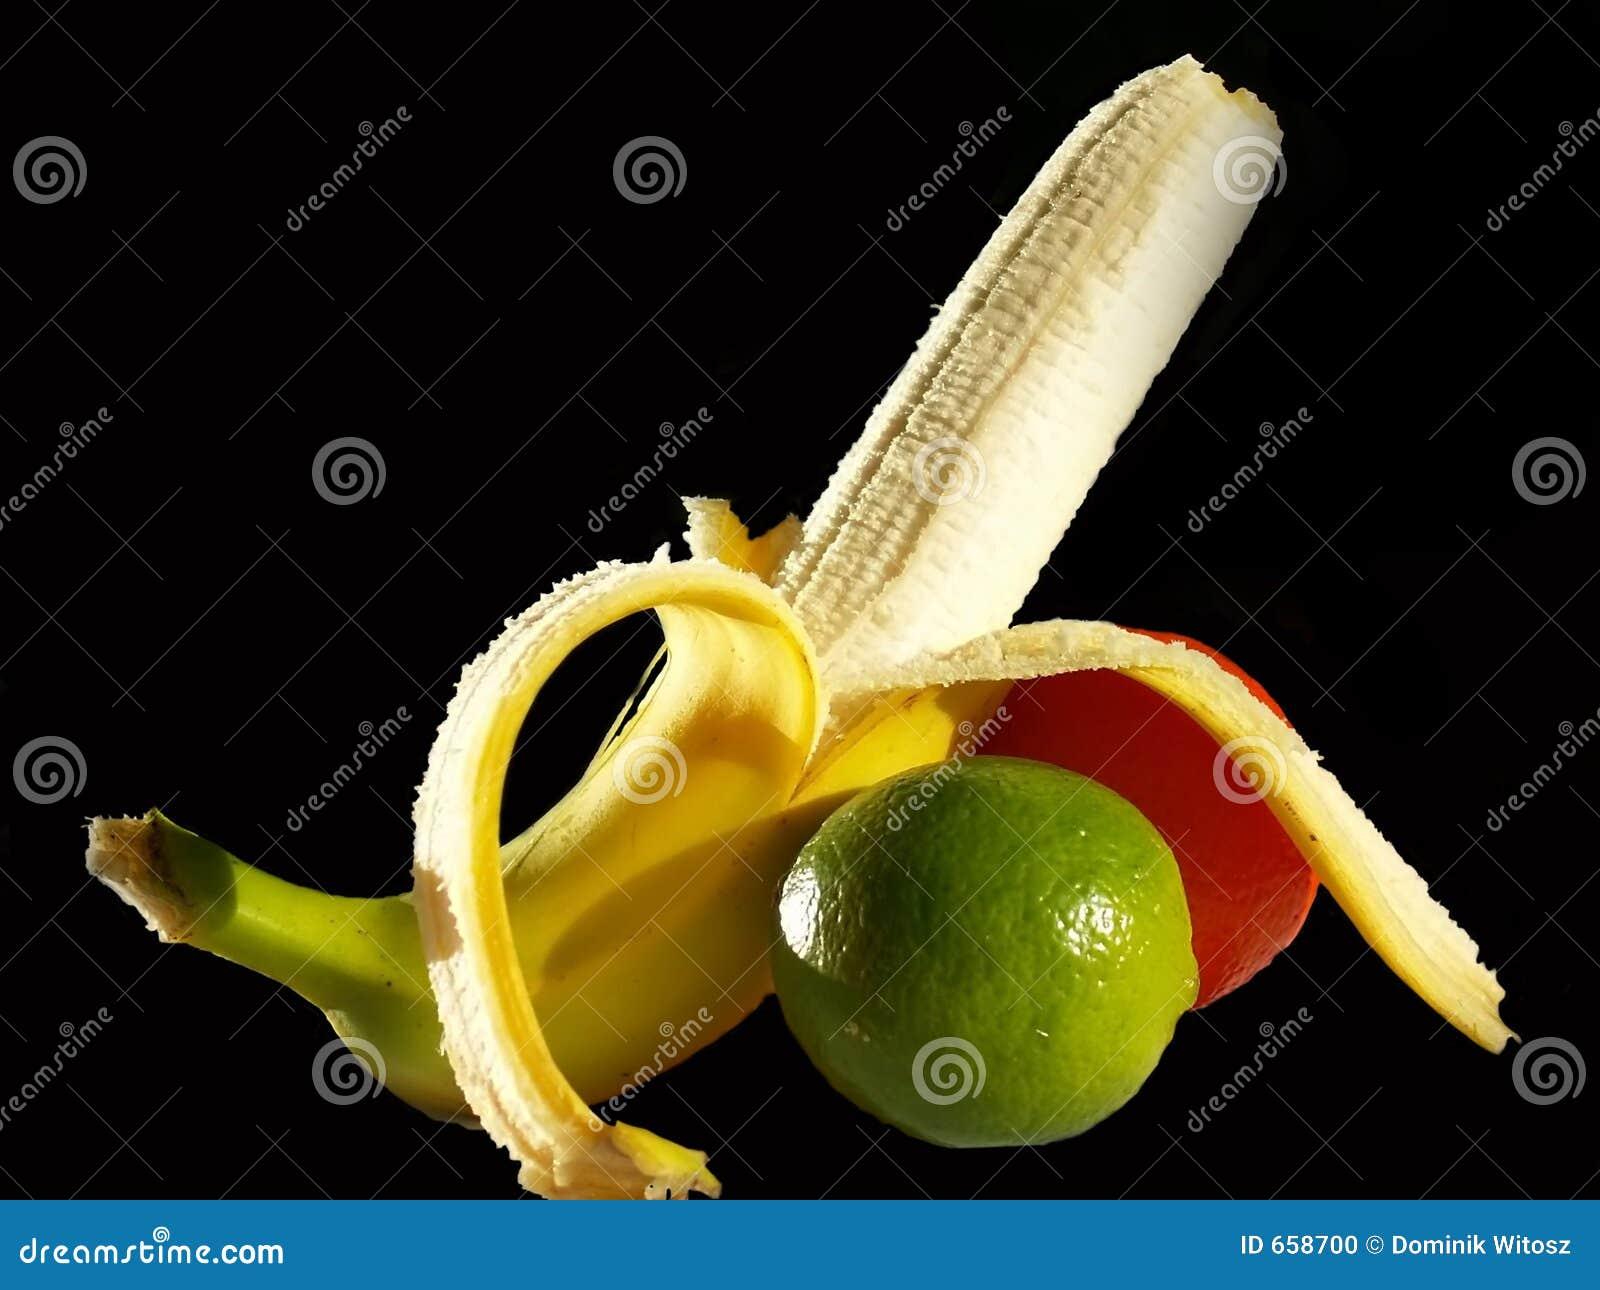 Banana Stock Photo - Image: 658700